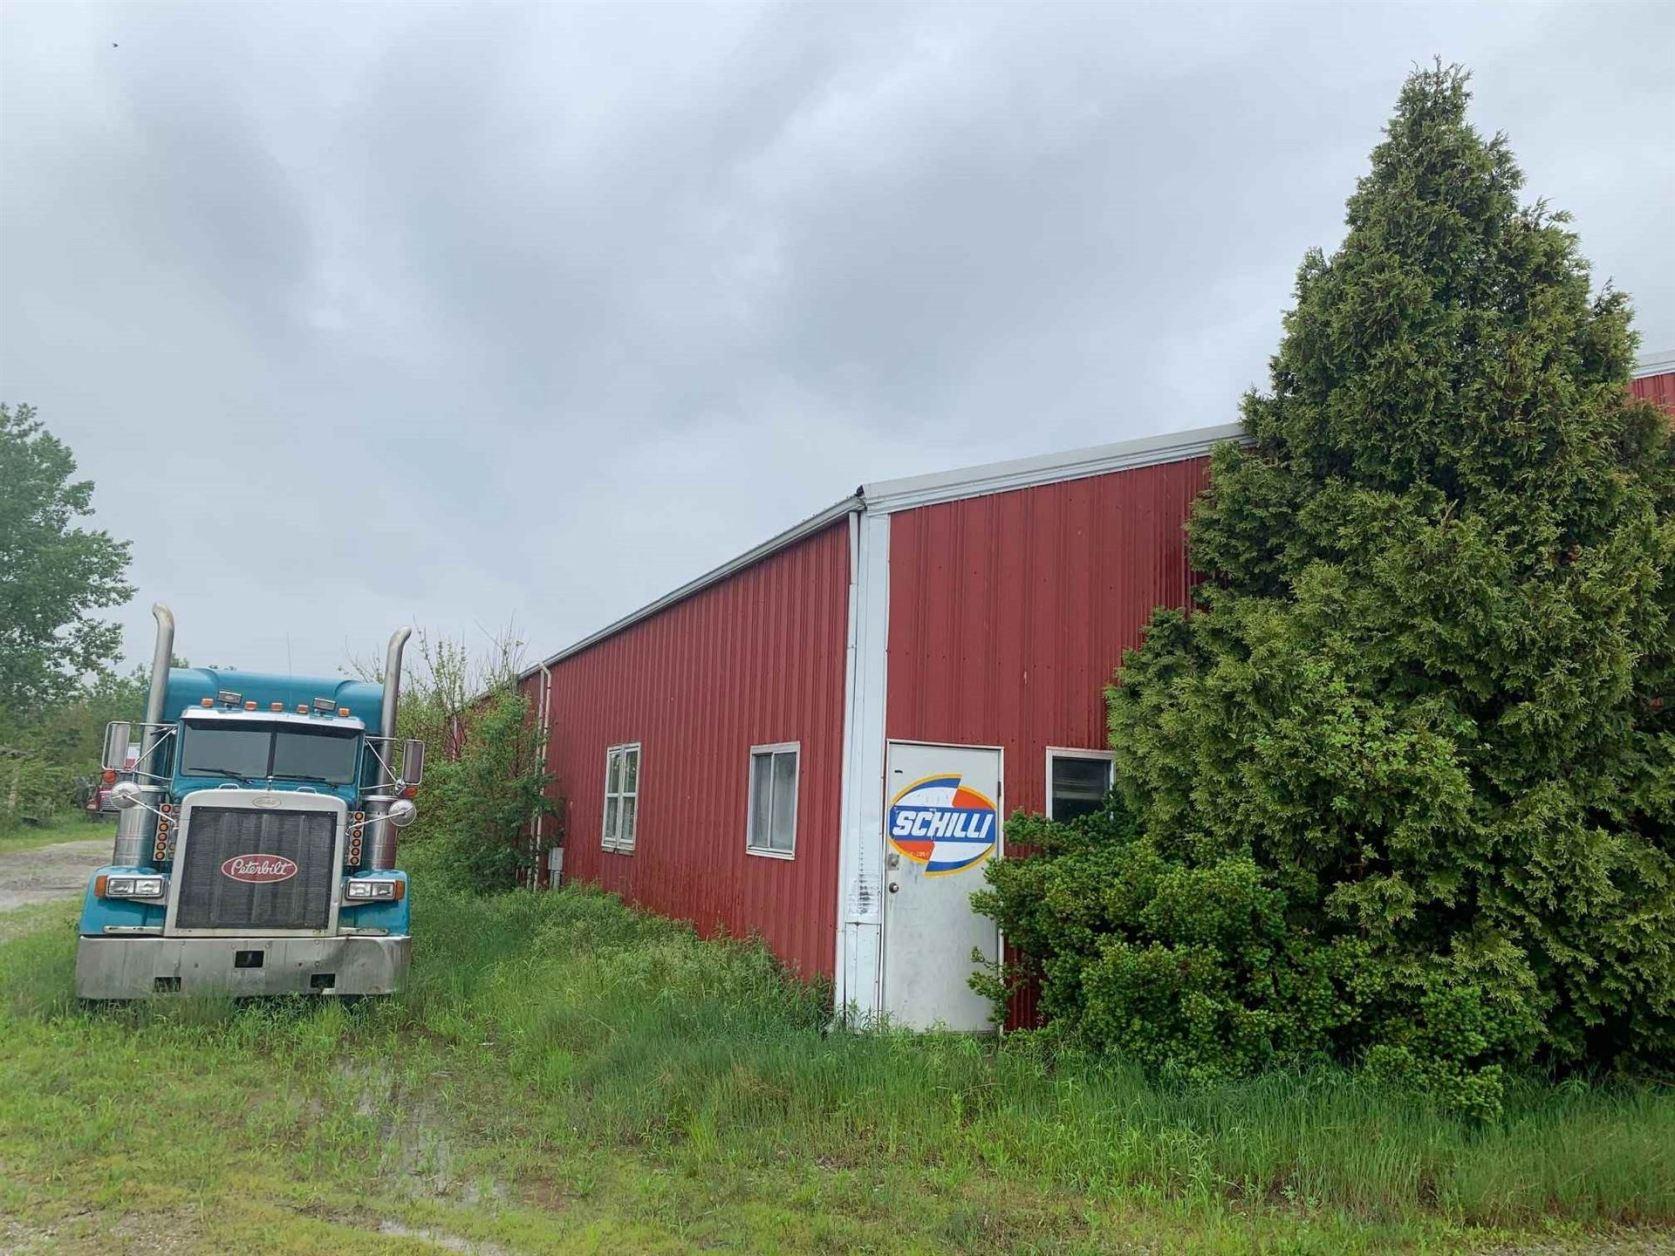 Photo of 11738 W US Highway 24 Highway, Wolcott, IN 47995 (MLS # 202026050)